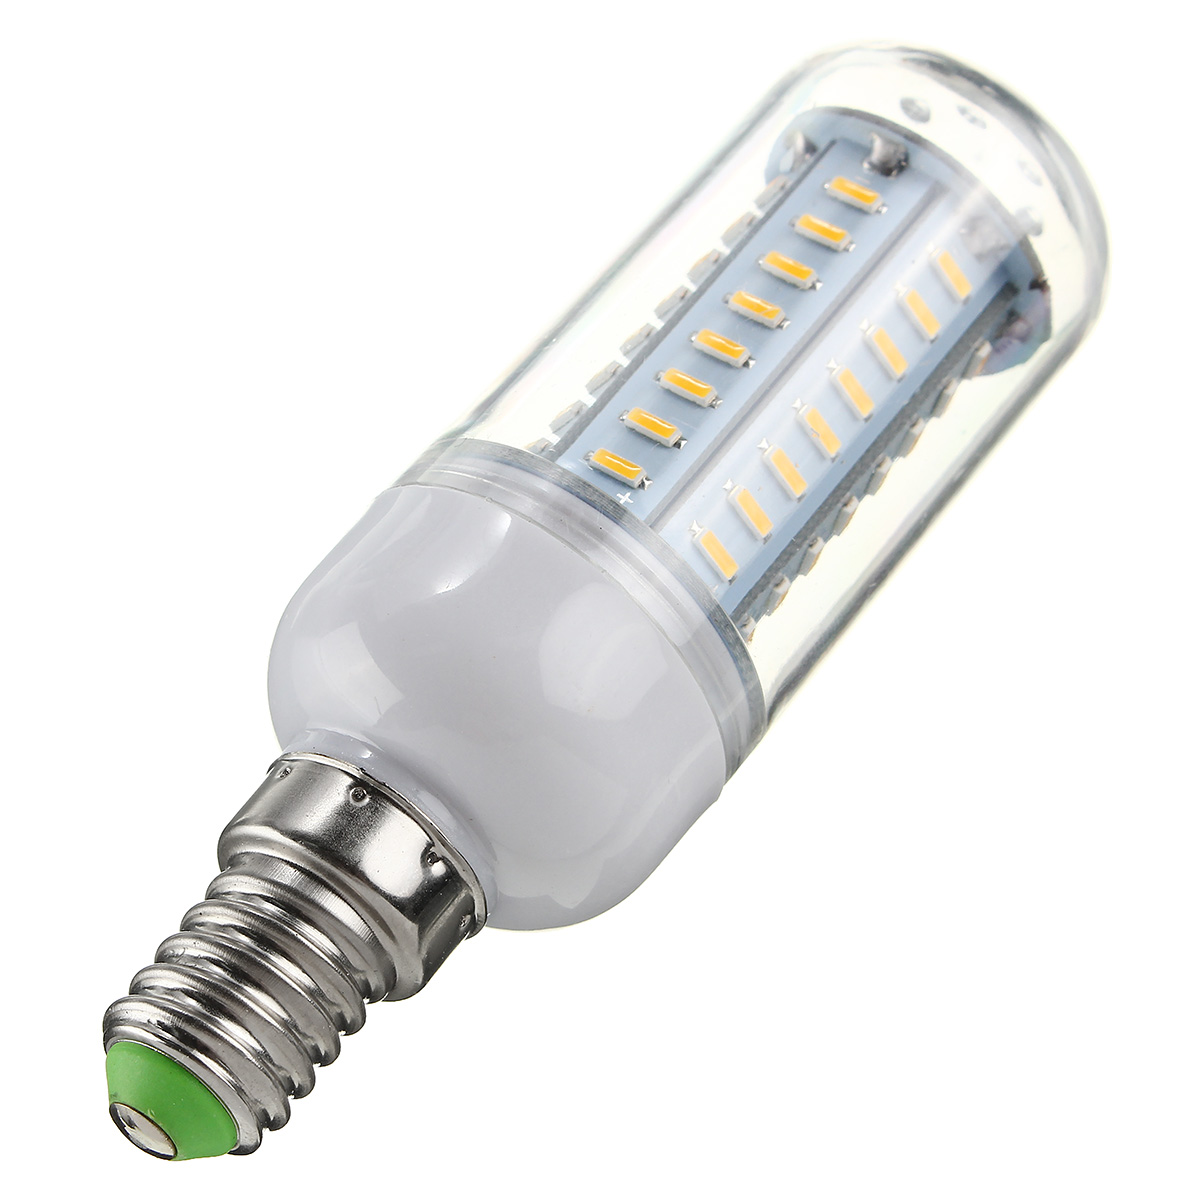 dimmable e14 e27 g9 gu10 b22 e12 smd4014 5w led corn bulb light home lamp ac220v alex nld. Black Bedroom Furniture Sets. Home Design Ideas